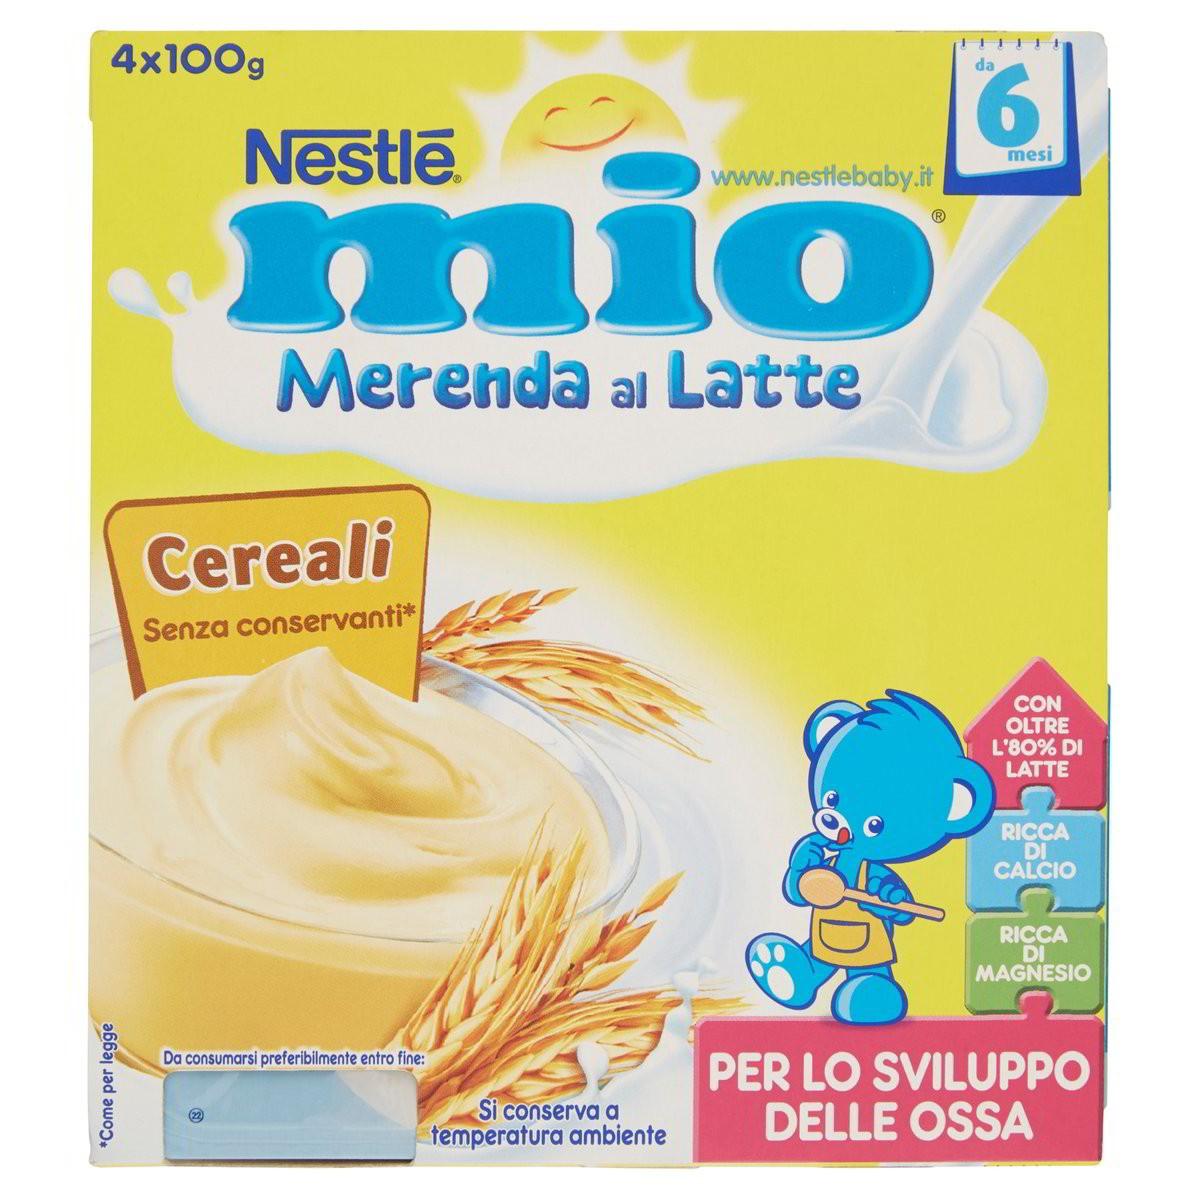 Nestlè Merenda al latte Mio